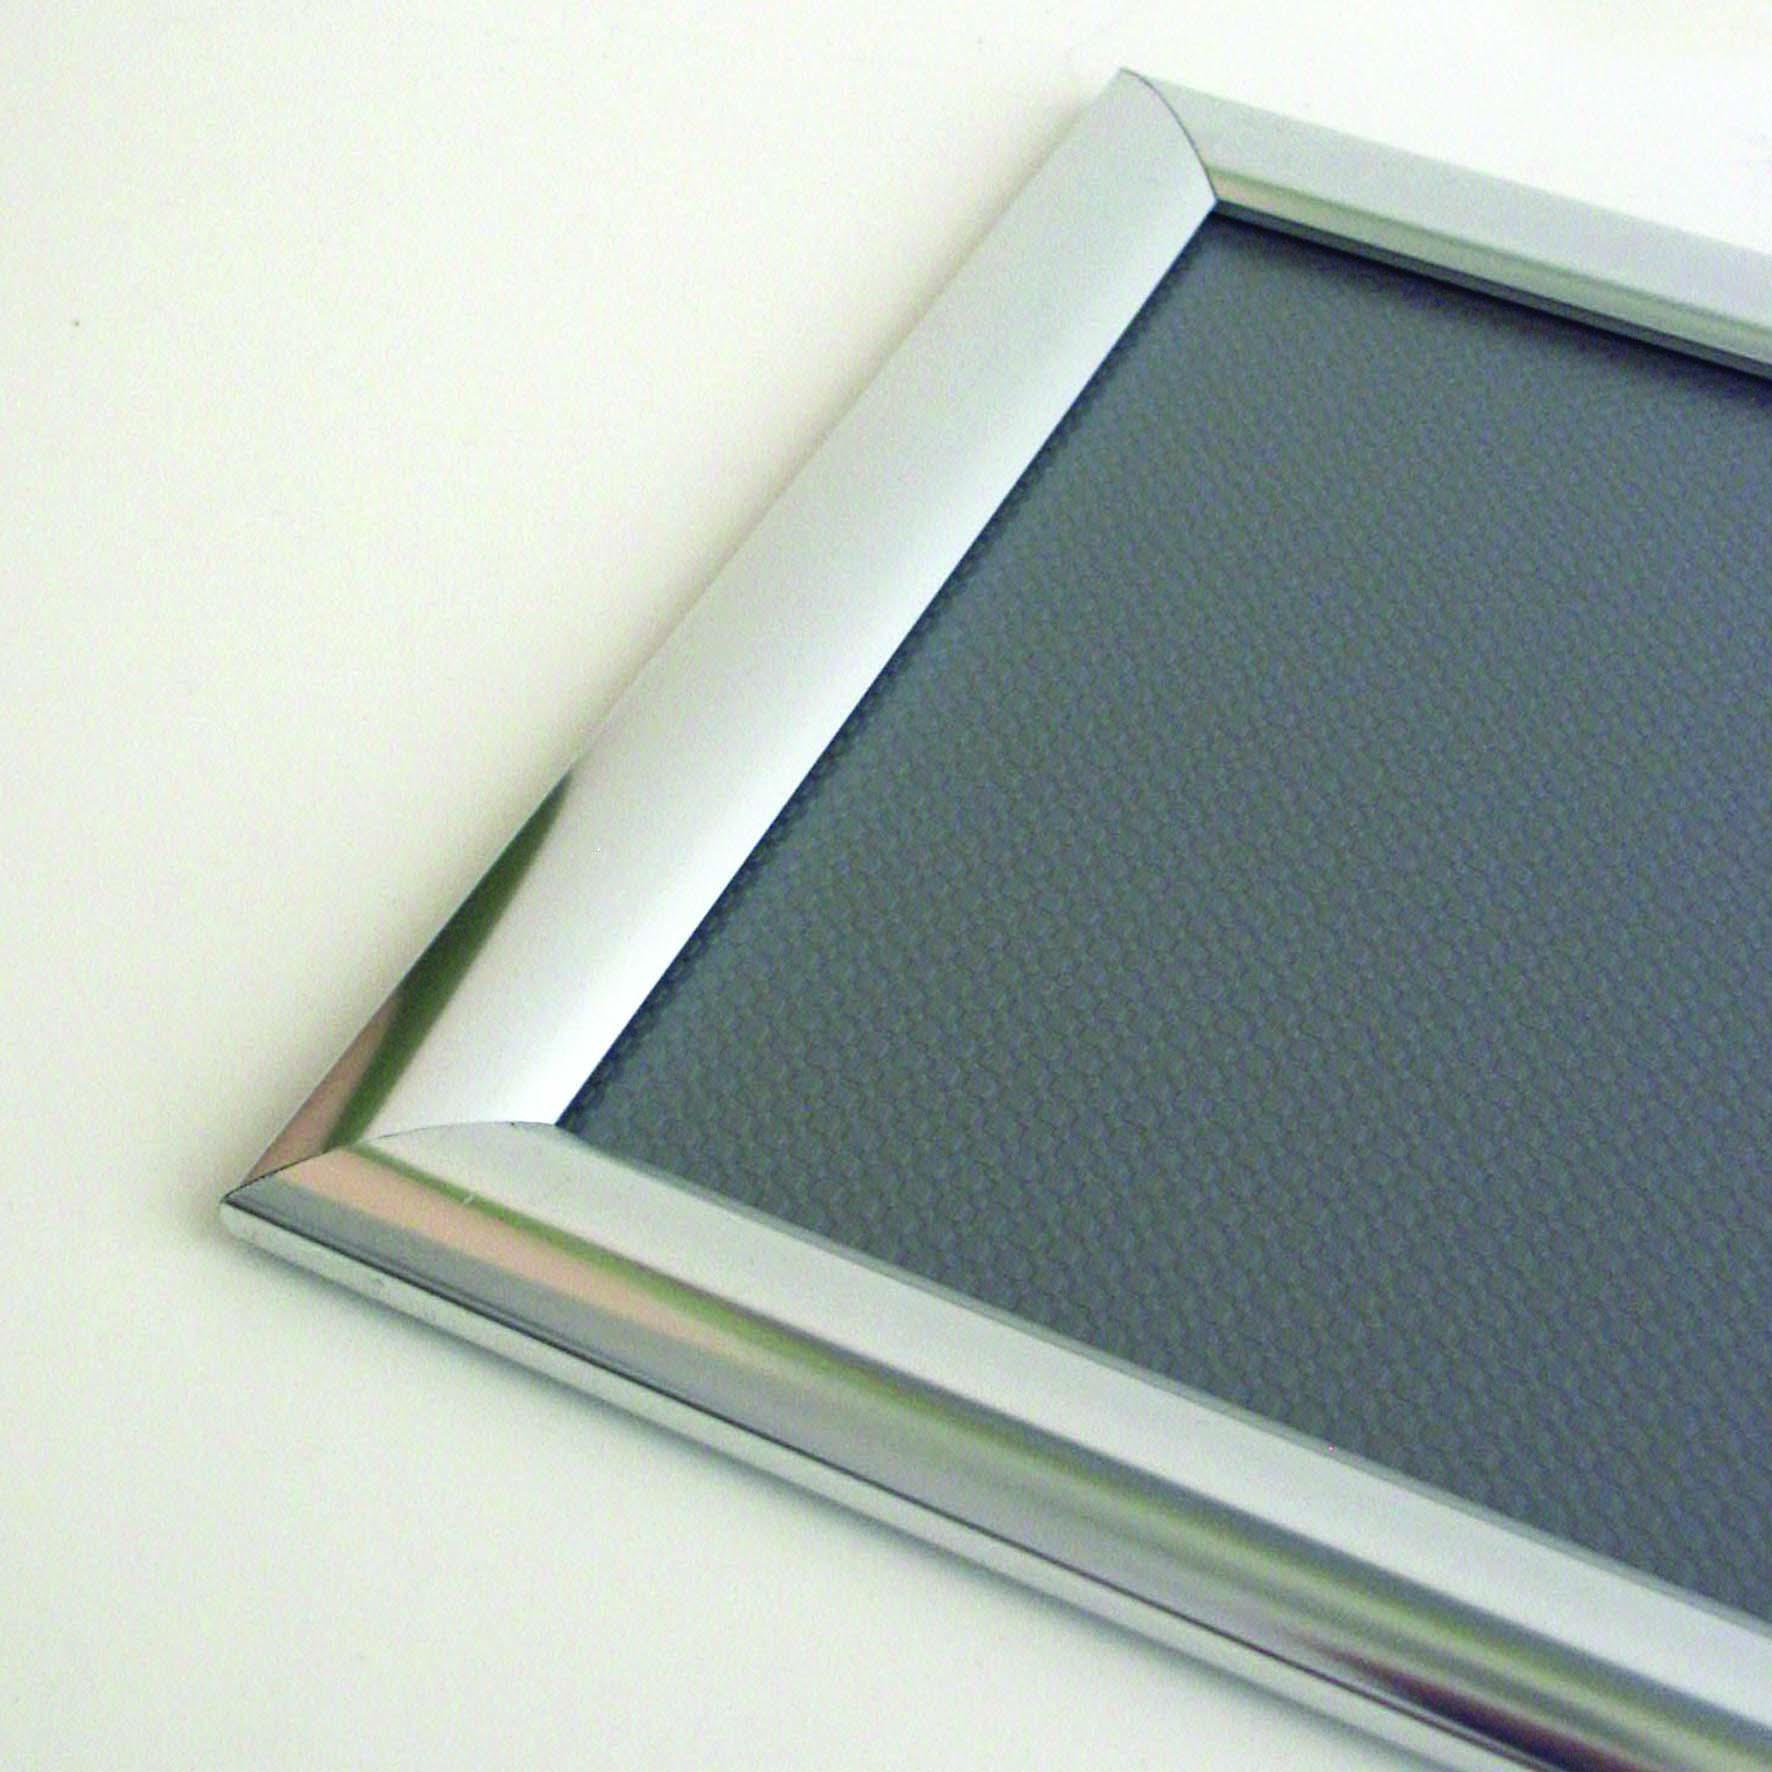 Klapprahmen 25 mm mit Edelstahl-Optik